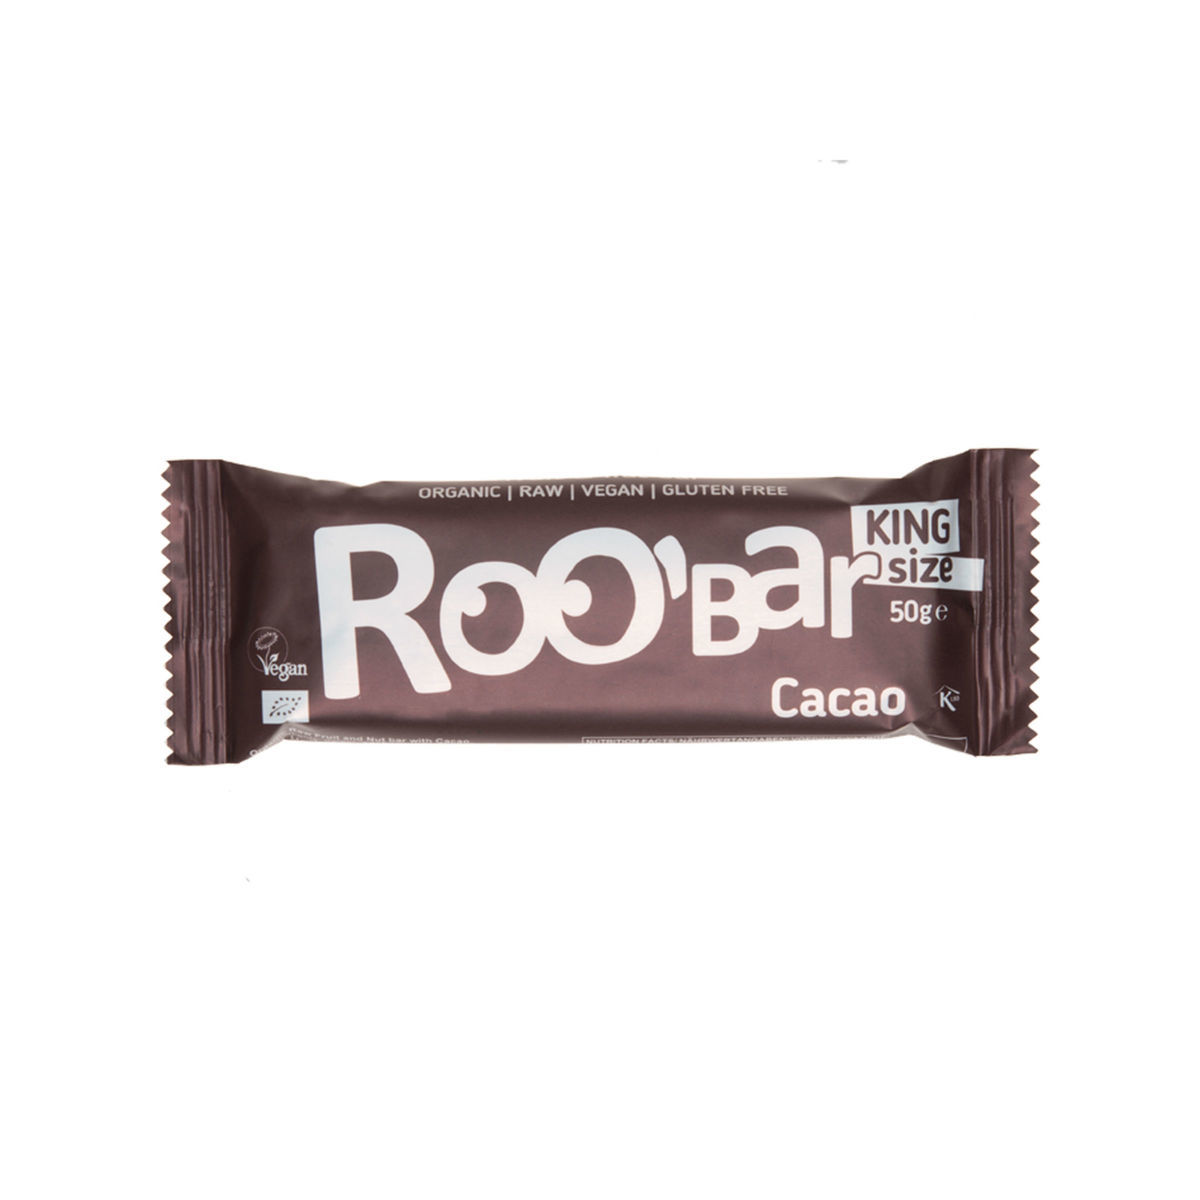 Rohkostriegel Kakao king size Riegel 50 g - Roobar